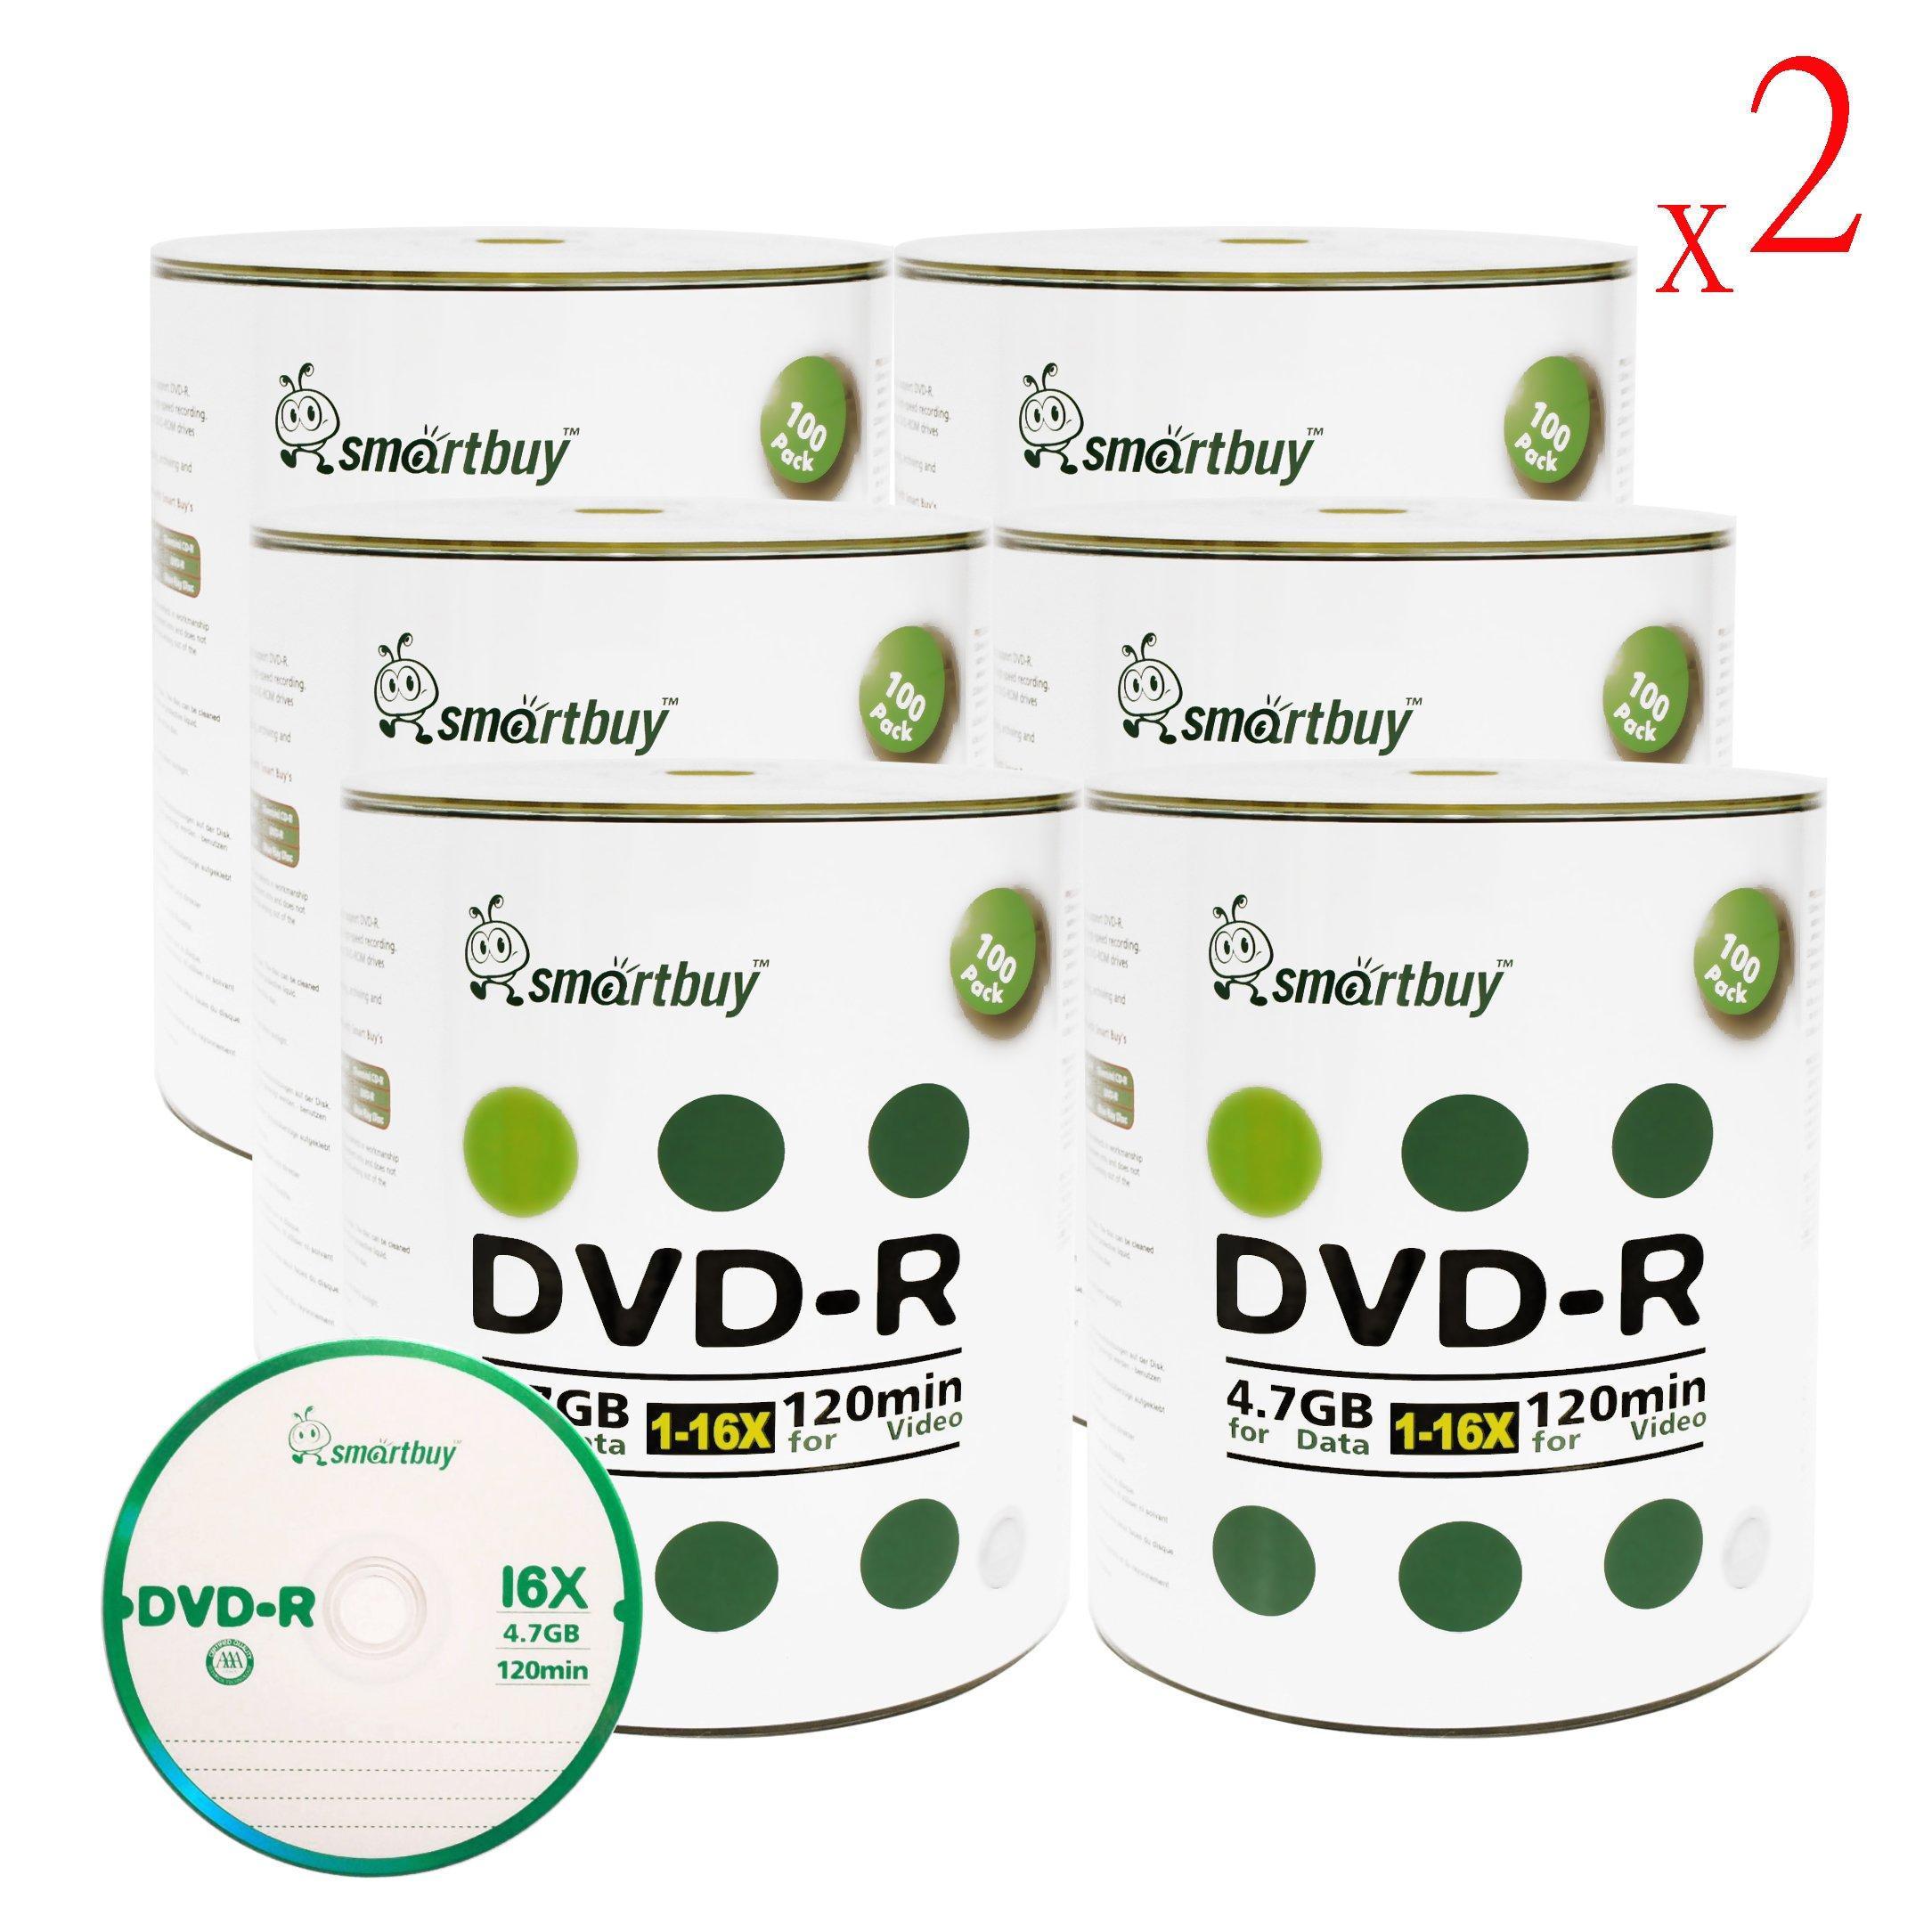 Smartbuy 4.7gb/120min 16x DVD-R Logo Top Blank Data Video Recordable Media Disc (1200-Disc)